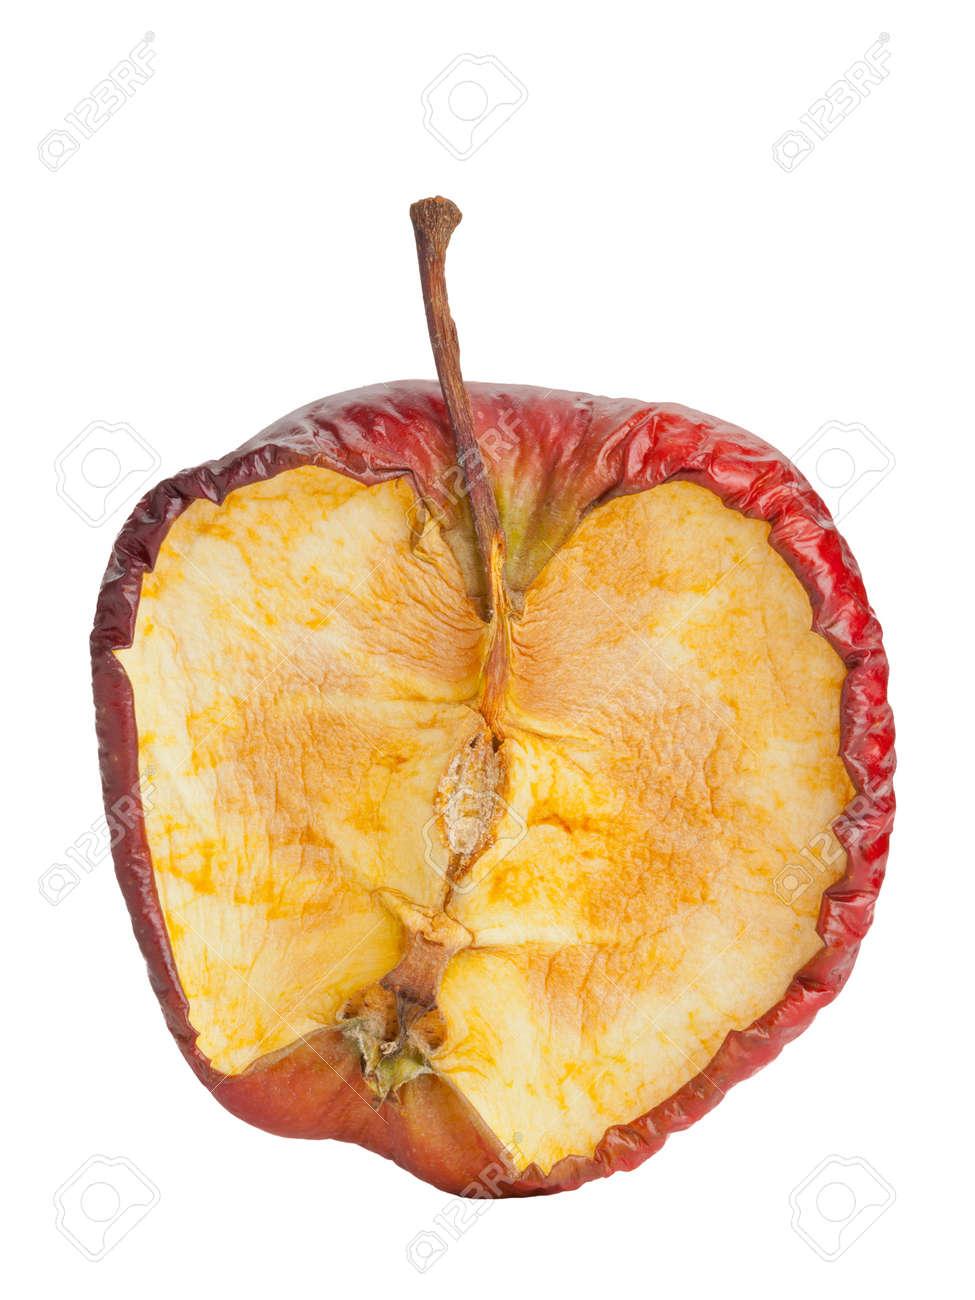 Half old dry rotten red apple on white background Standard-Bild - 17782773